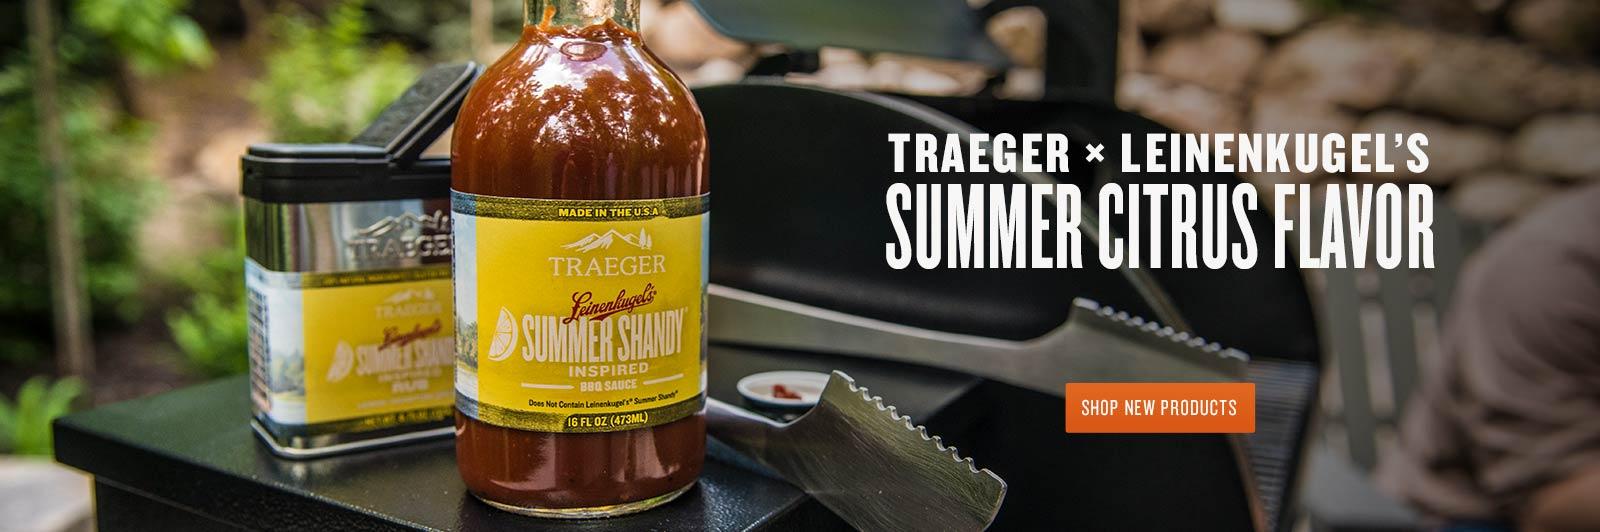 Traeger X Leinenkugel's Summer Citrus Flavor